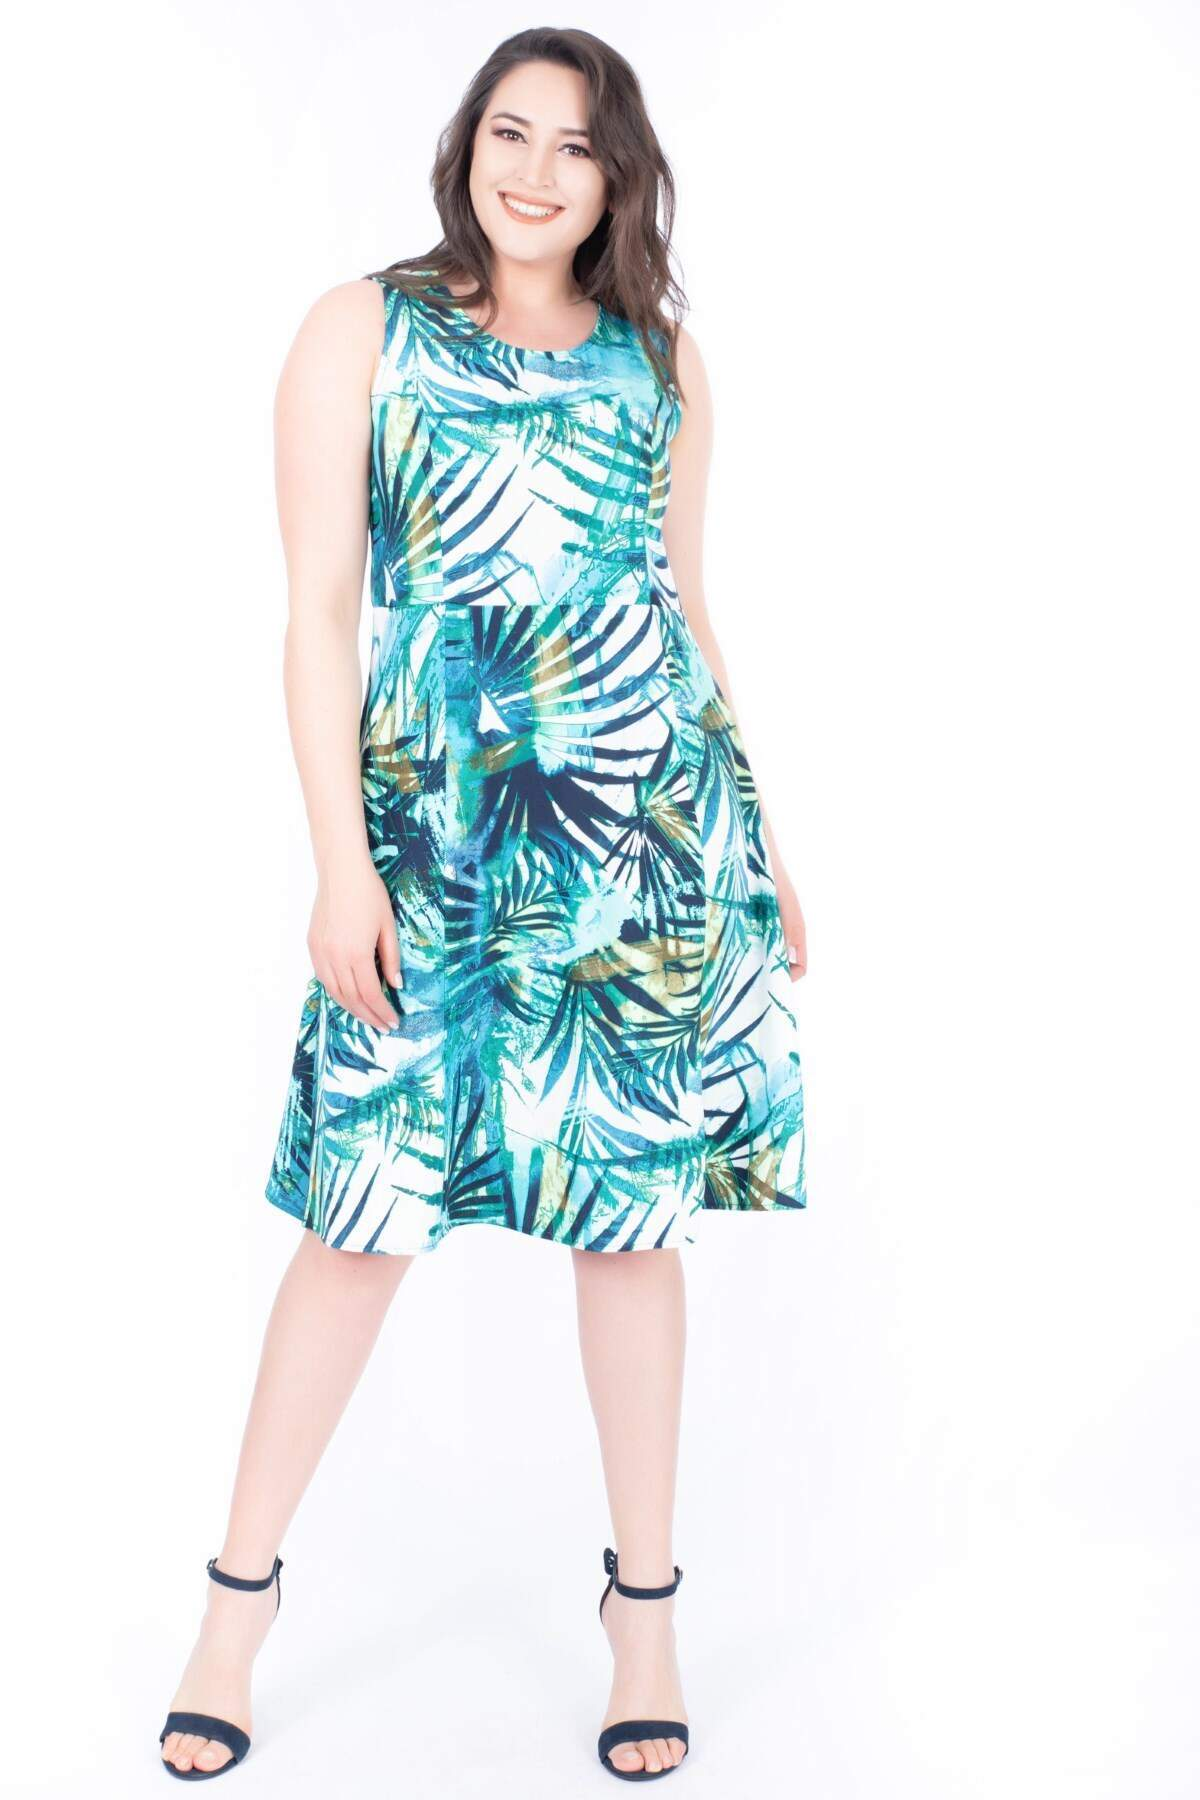 Women's Sleeveless Patterned Dress